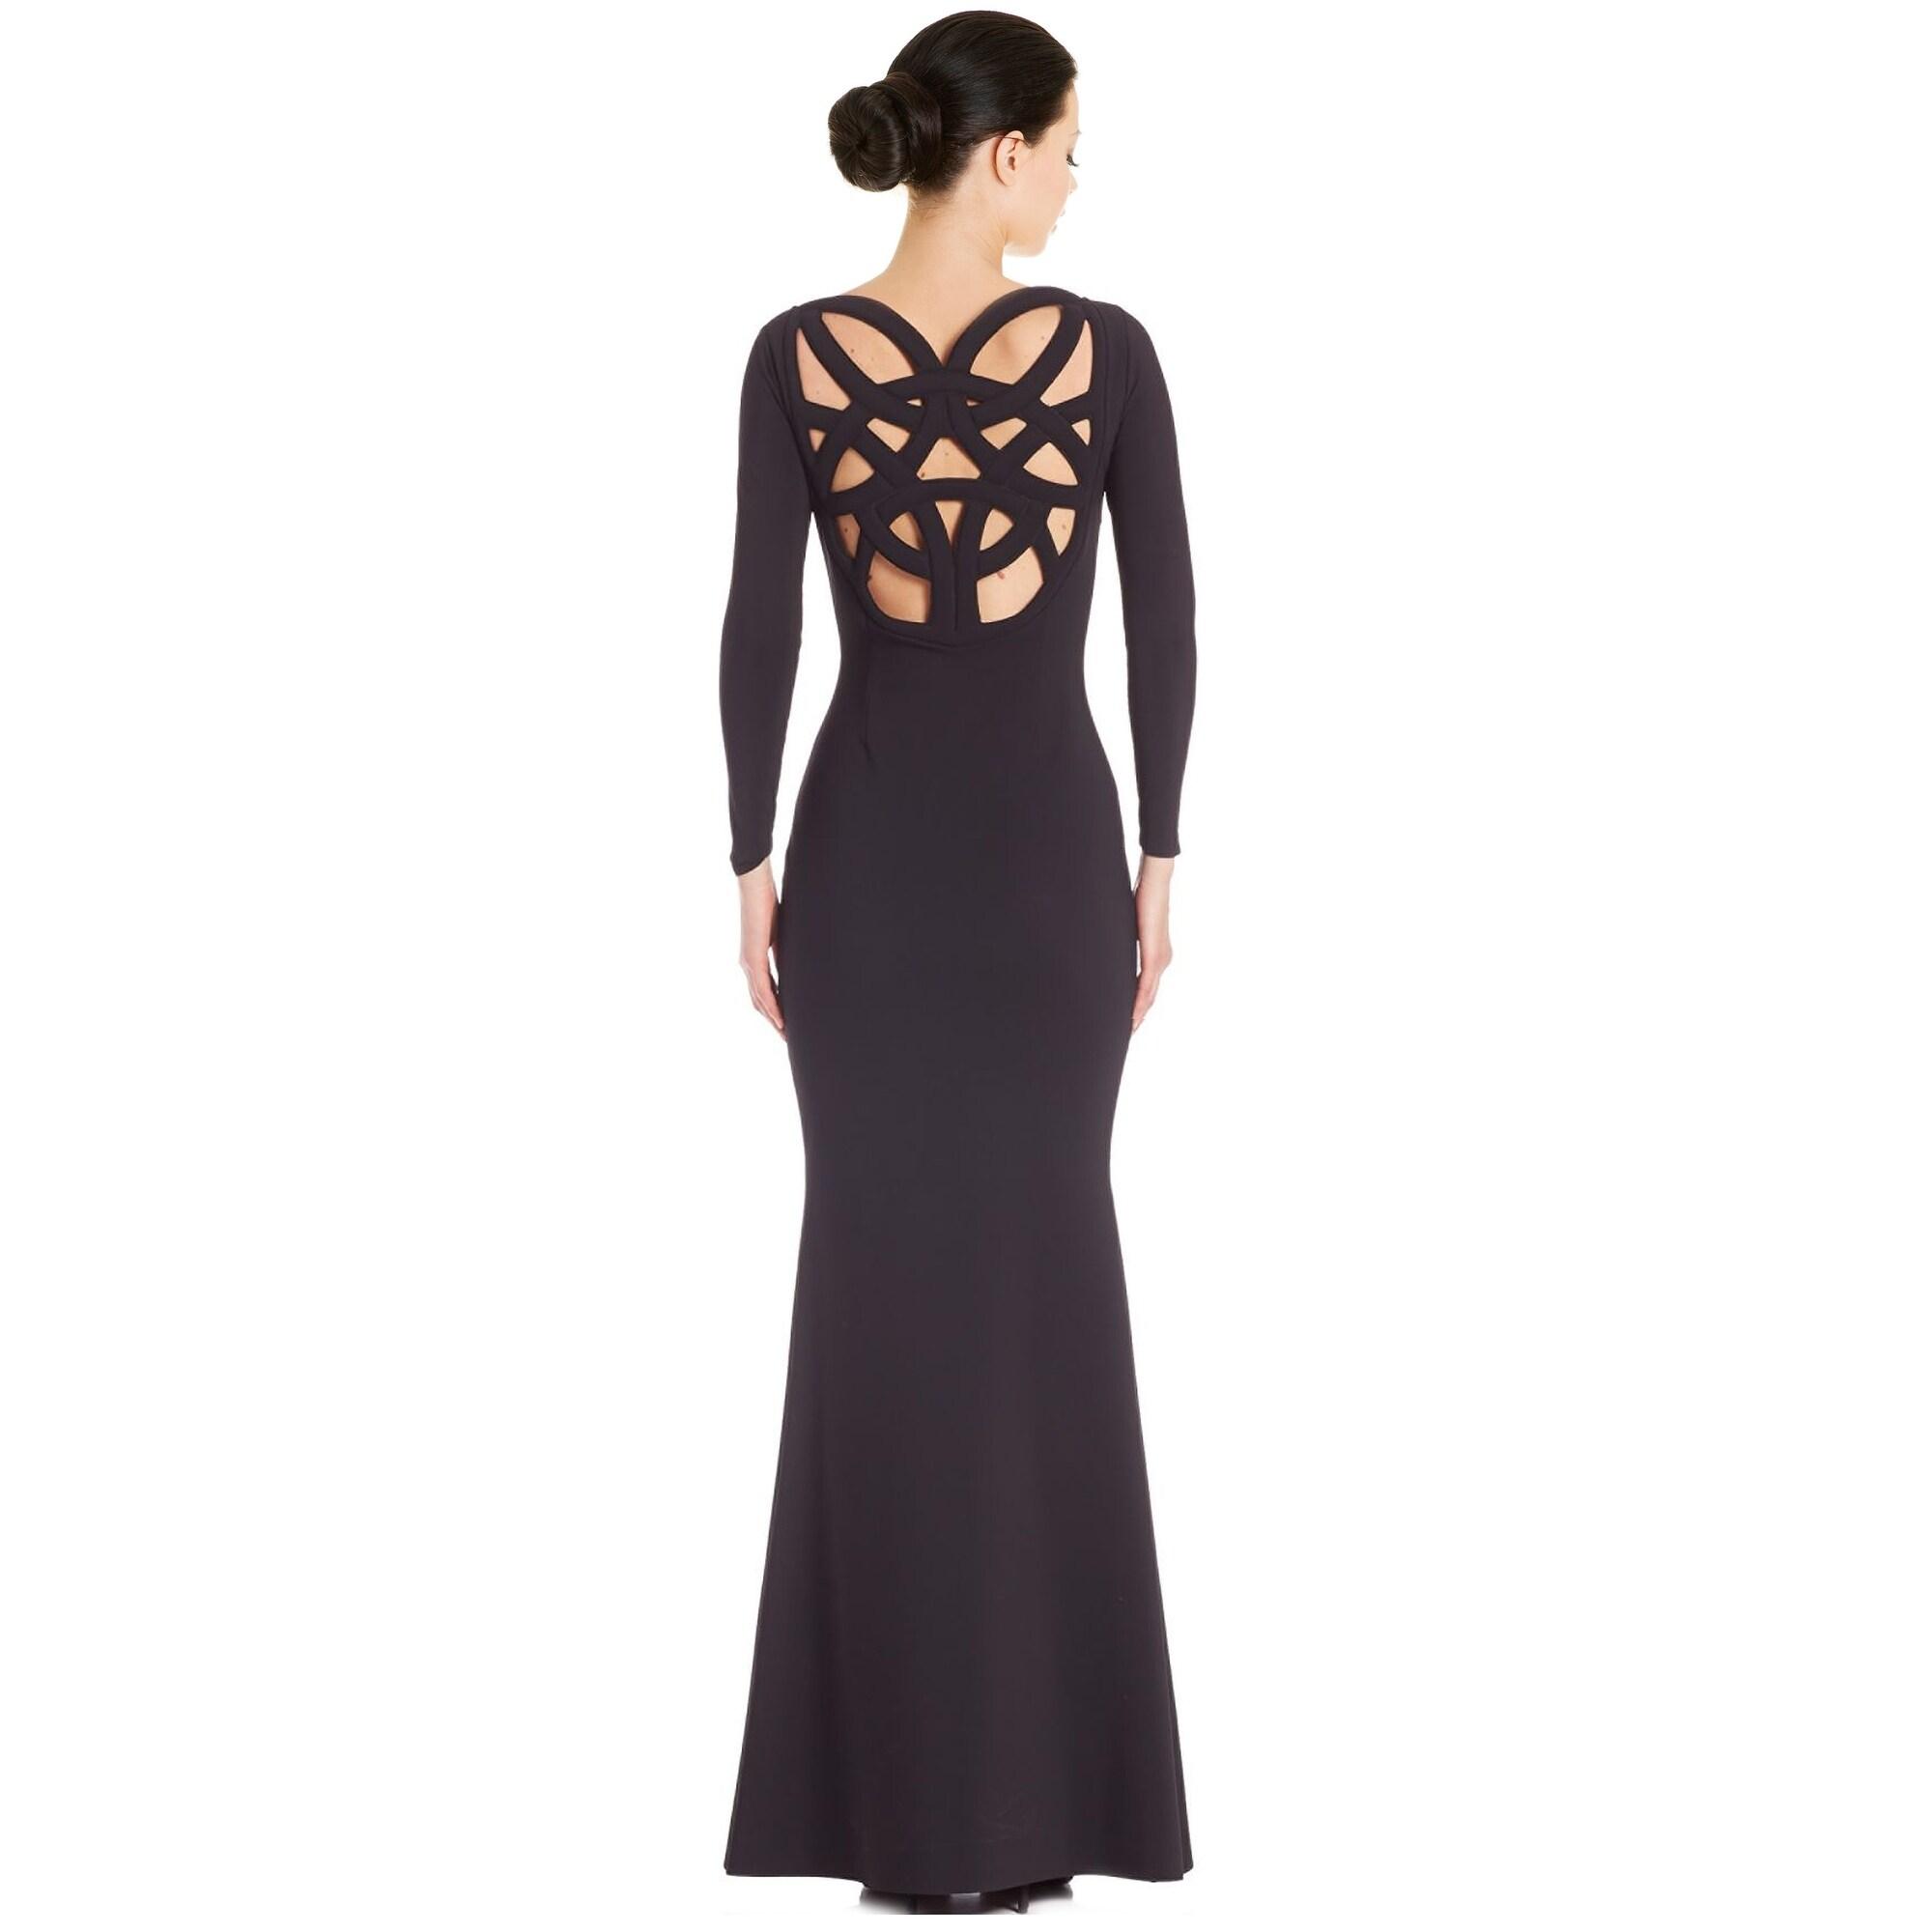 Shop La Petite Robe di Chiara Boni Back Cutout 3/4 Sleeve Evening ...